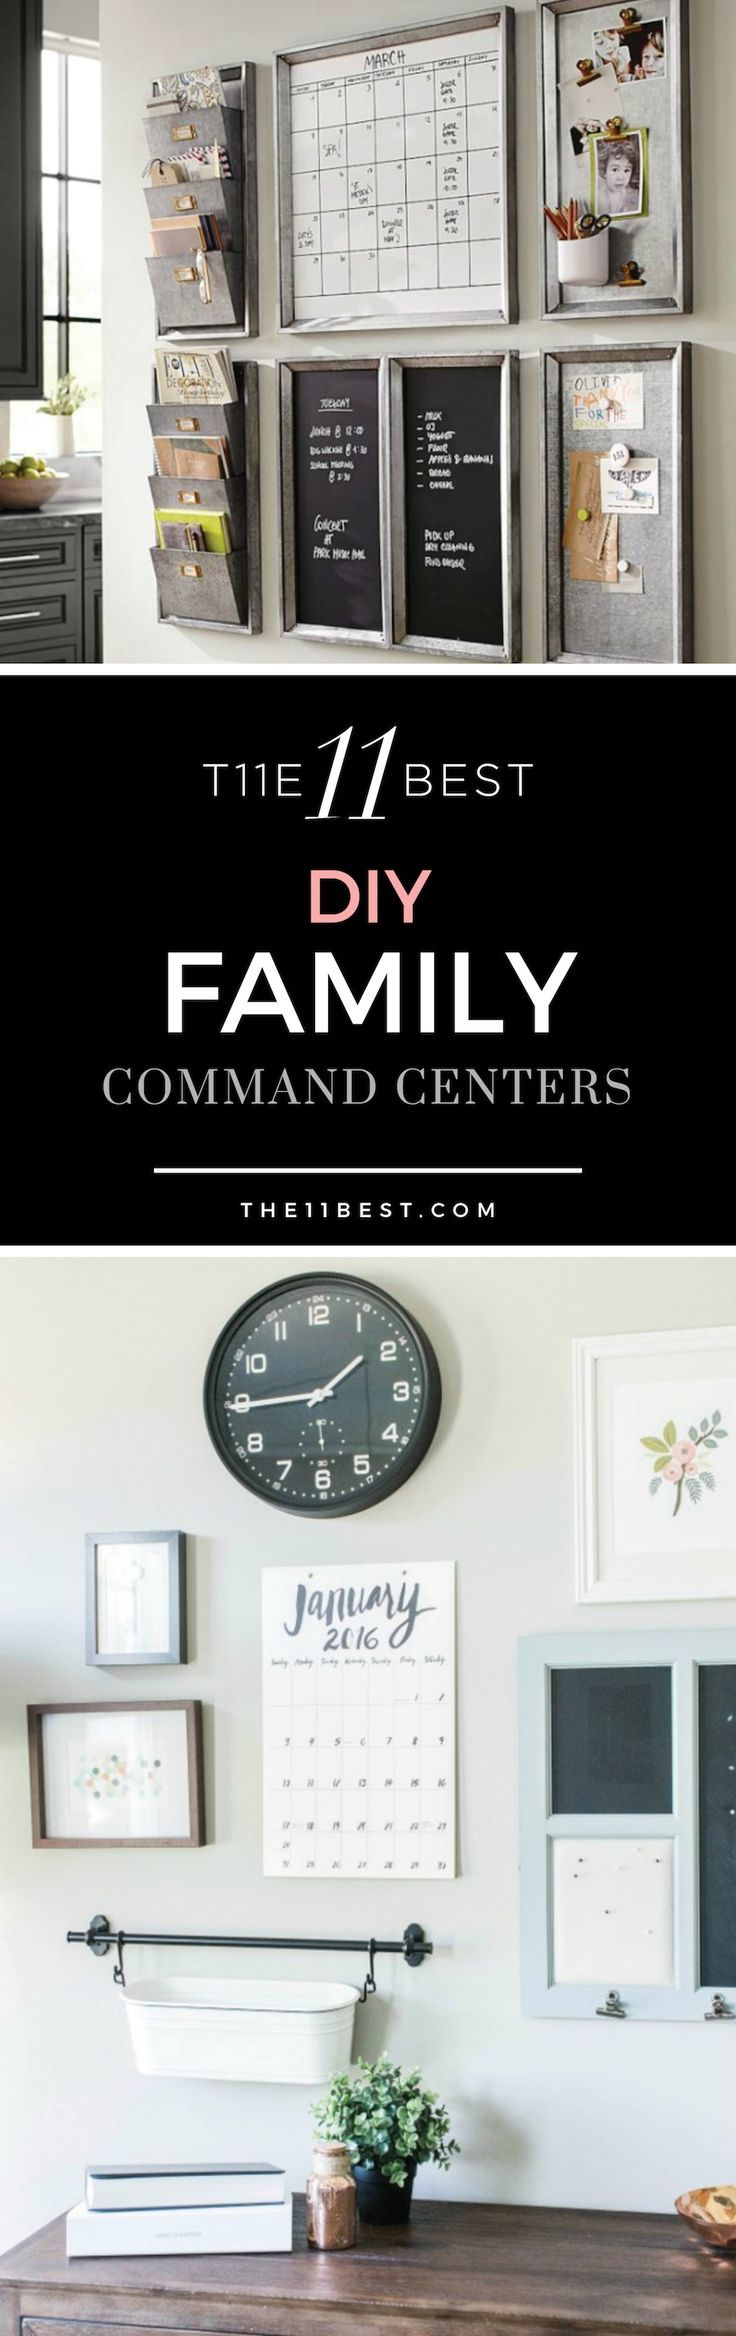 DIY Family Command Center and Family Organization ideas. Office Decor. Family office.